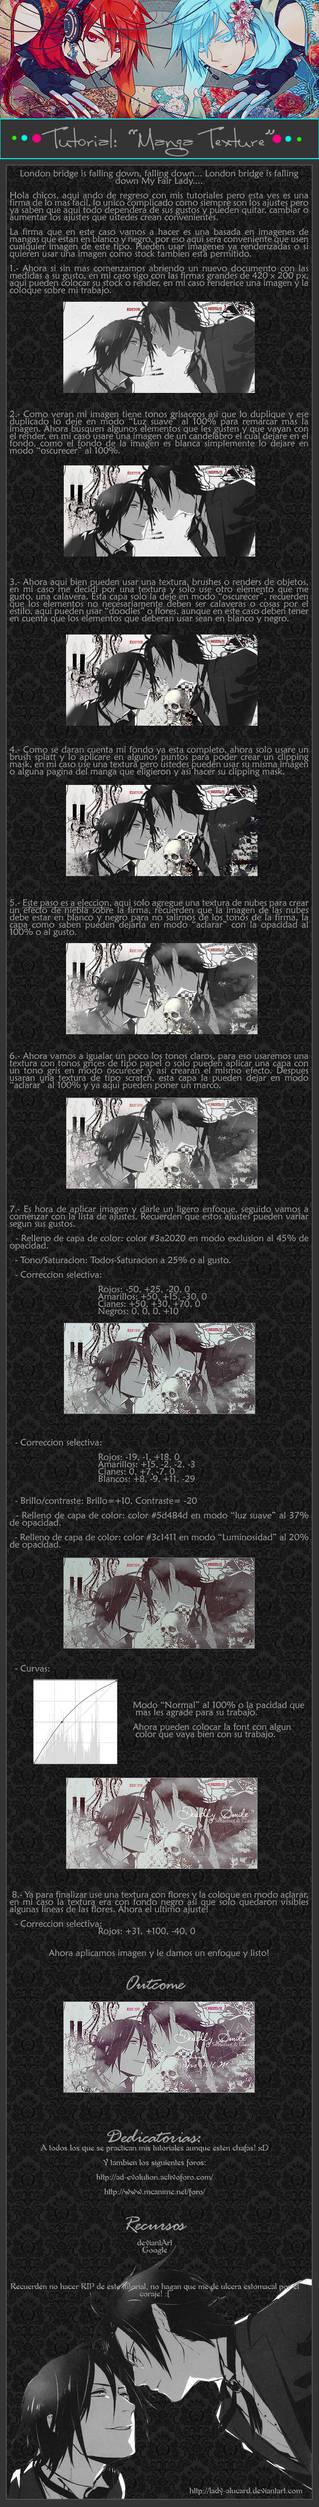 Tutorial Manga Texture